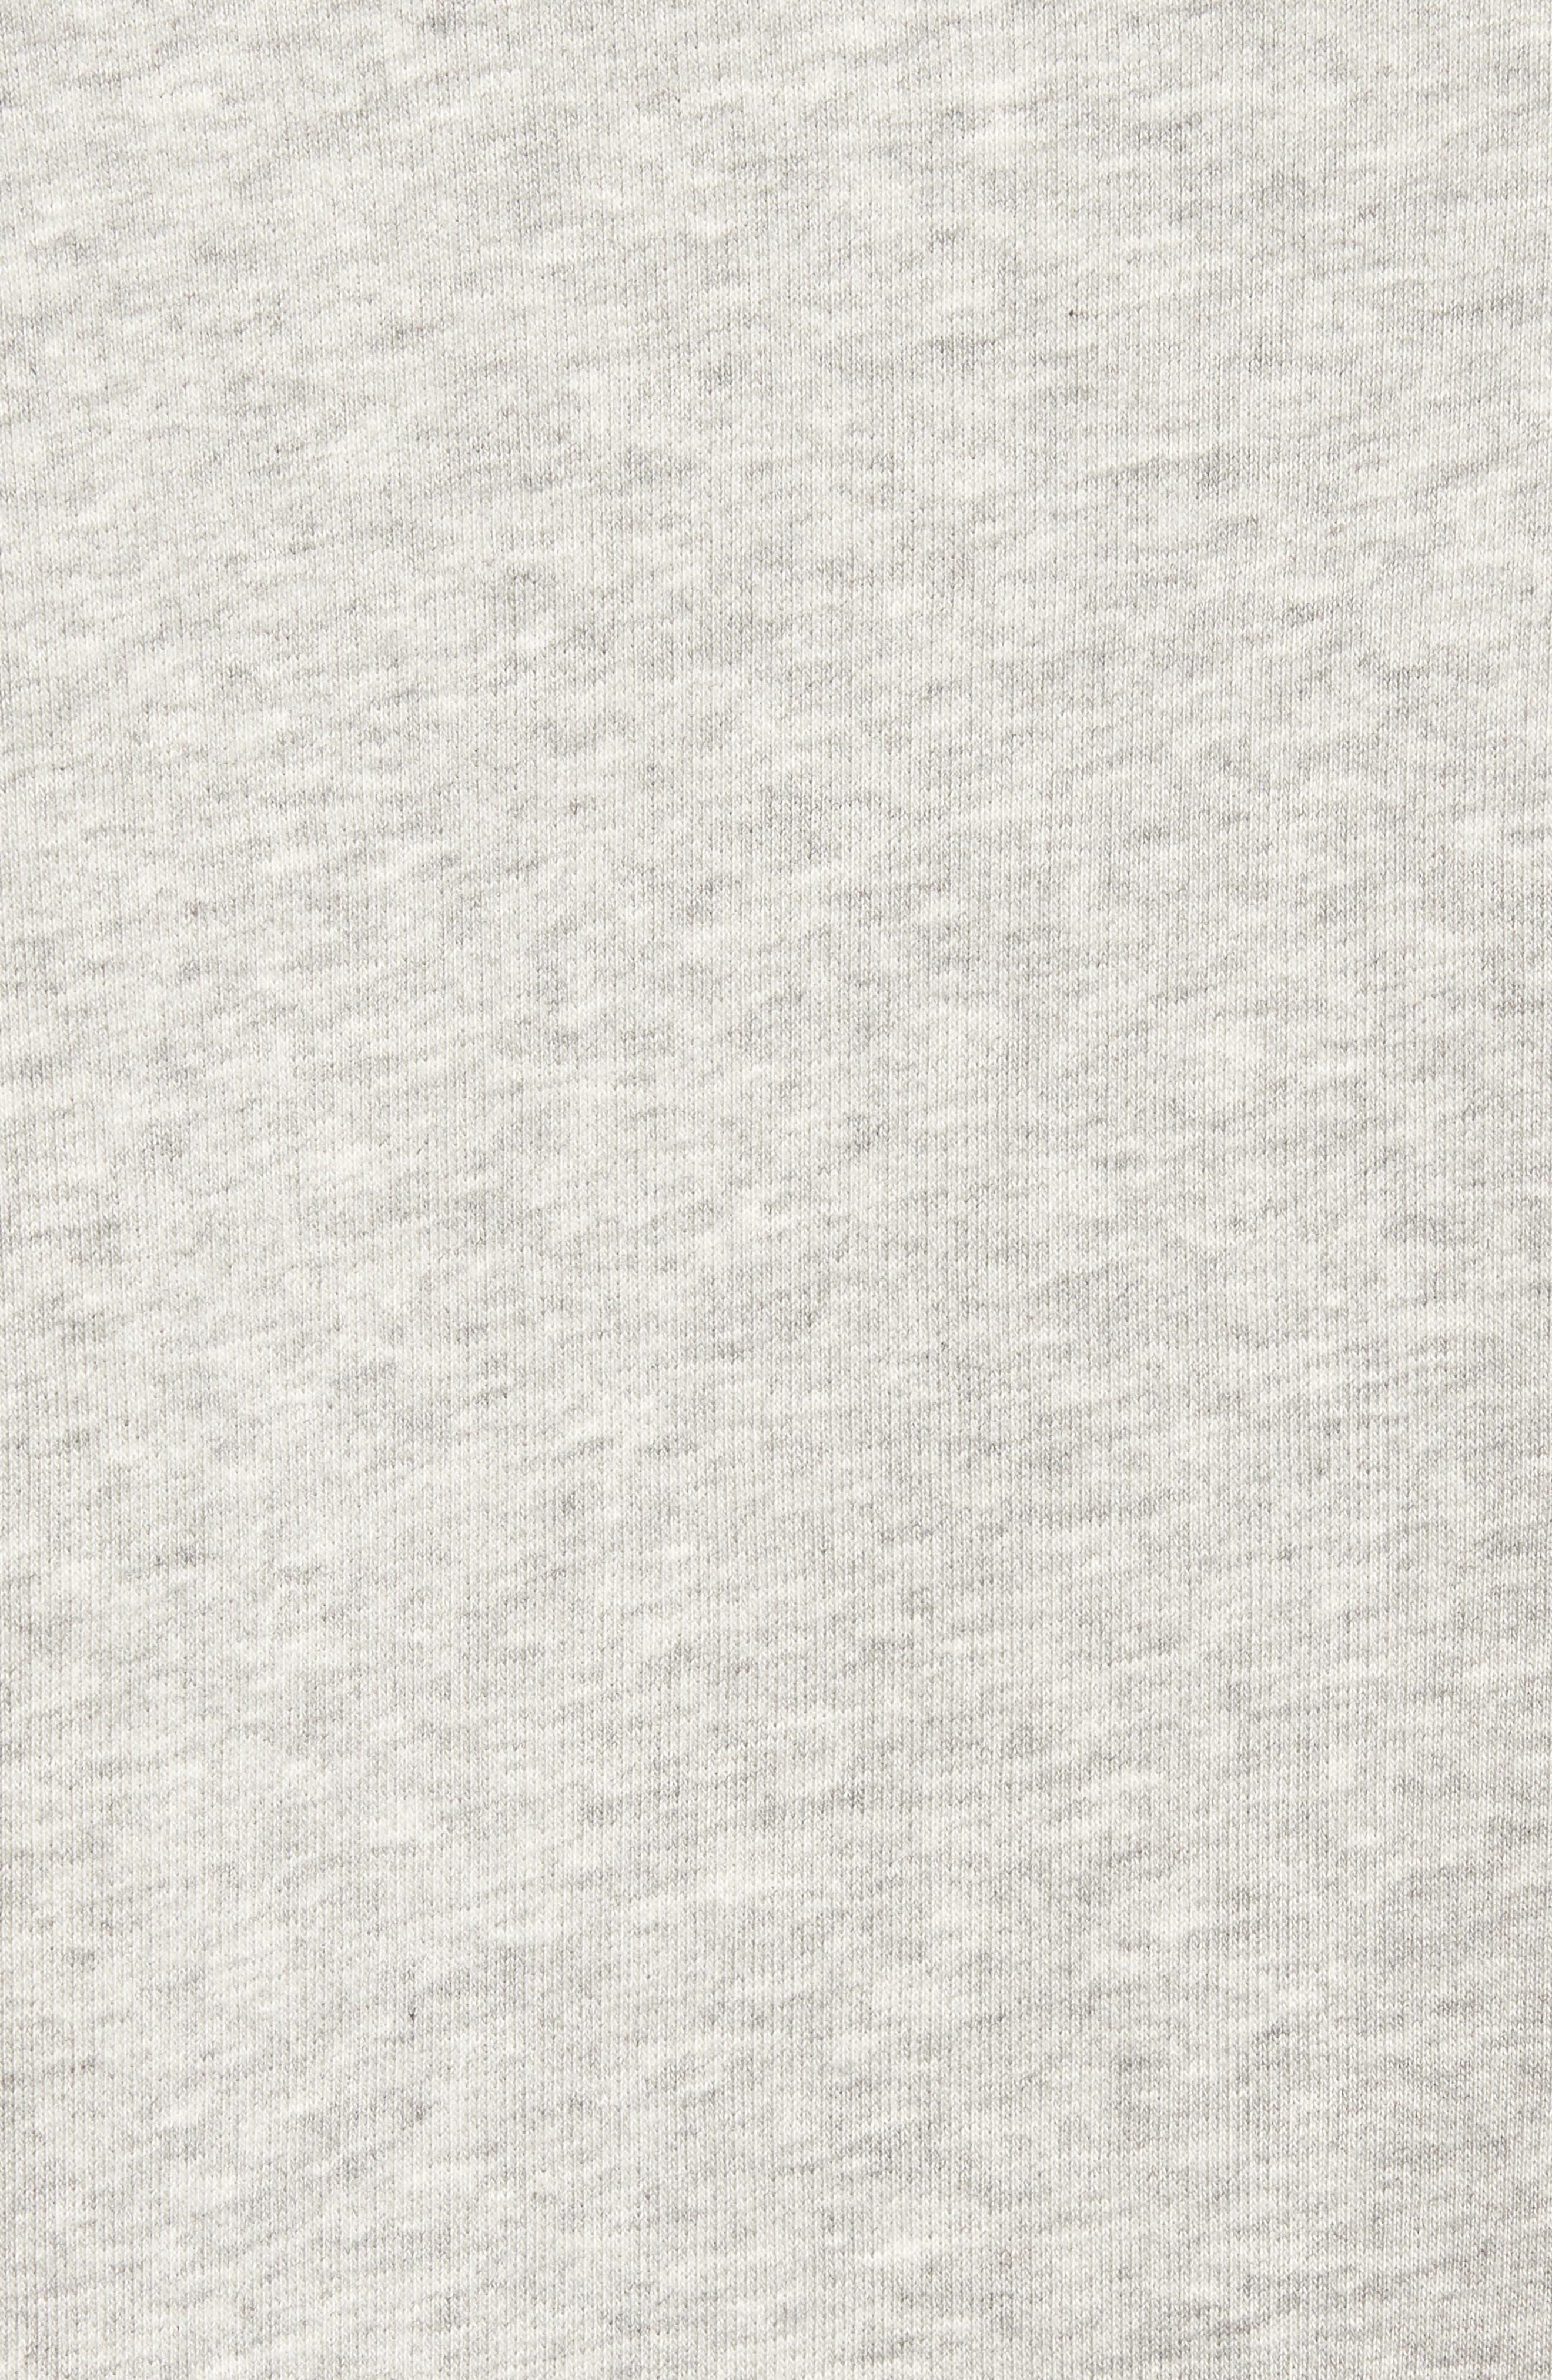 Lounge Crewneck Sweatshirt,                             Alternate thumbnail 5, color,                             Grey Heather